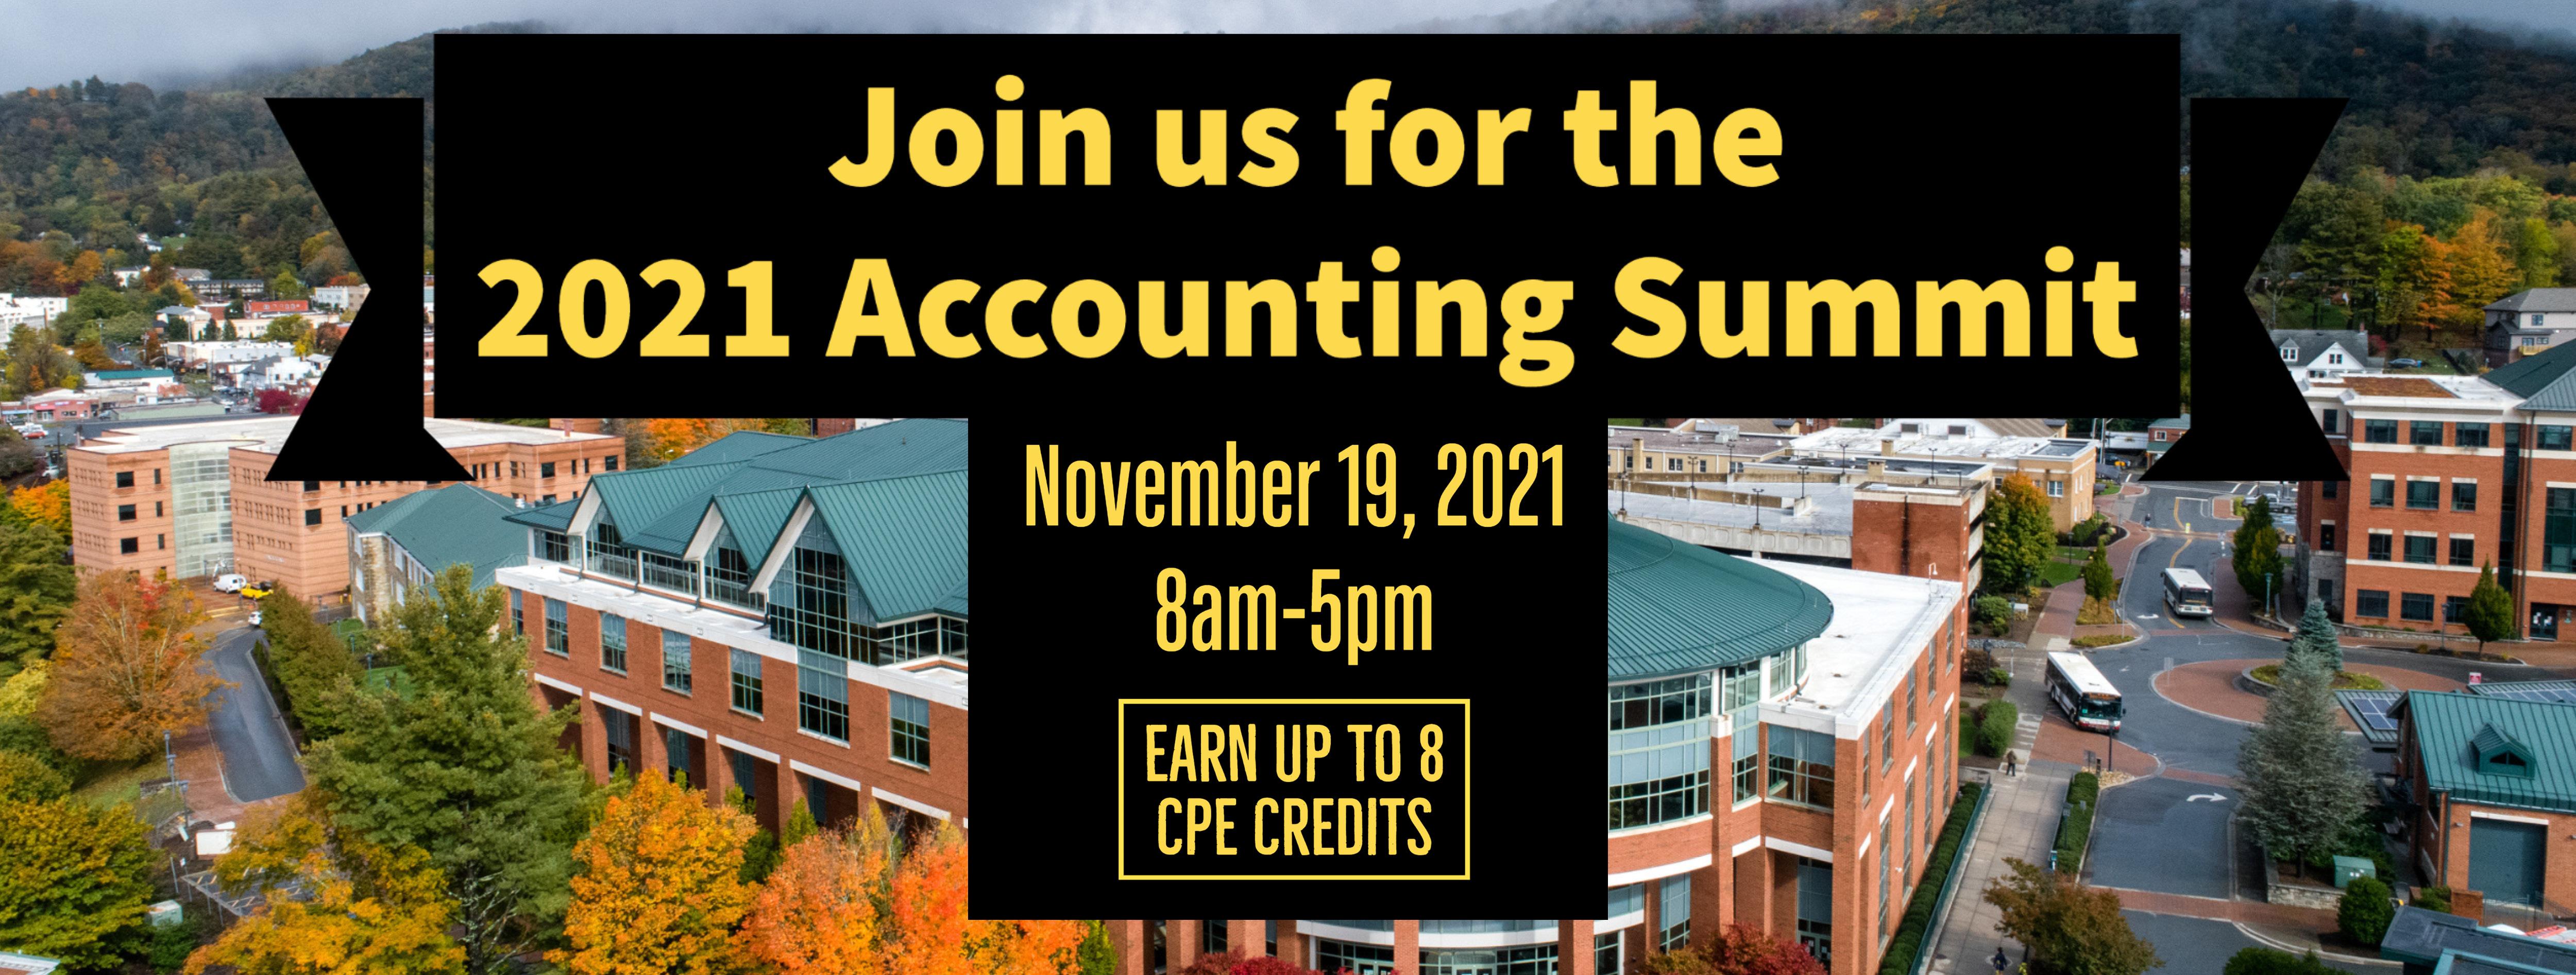 Accounting Summit